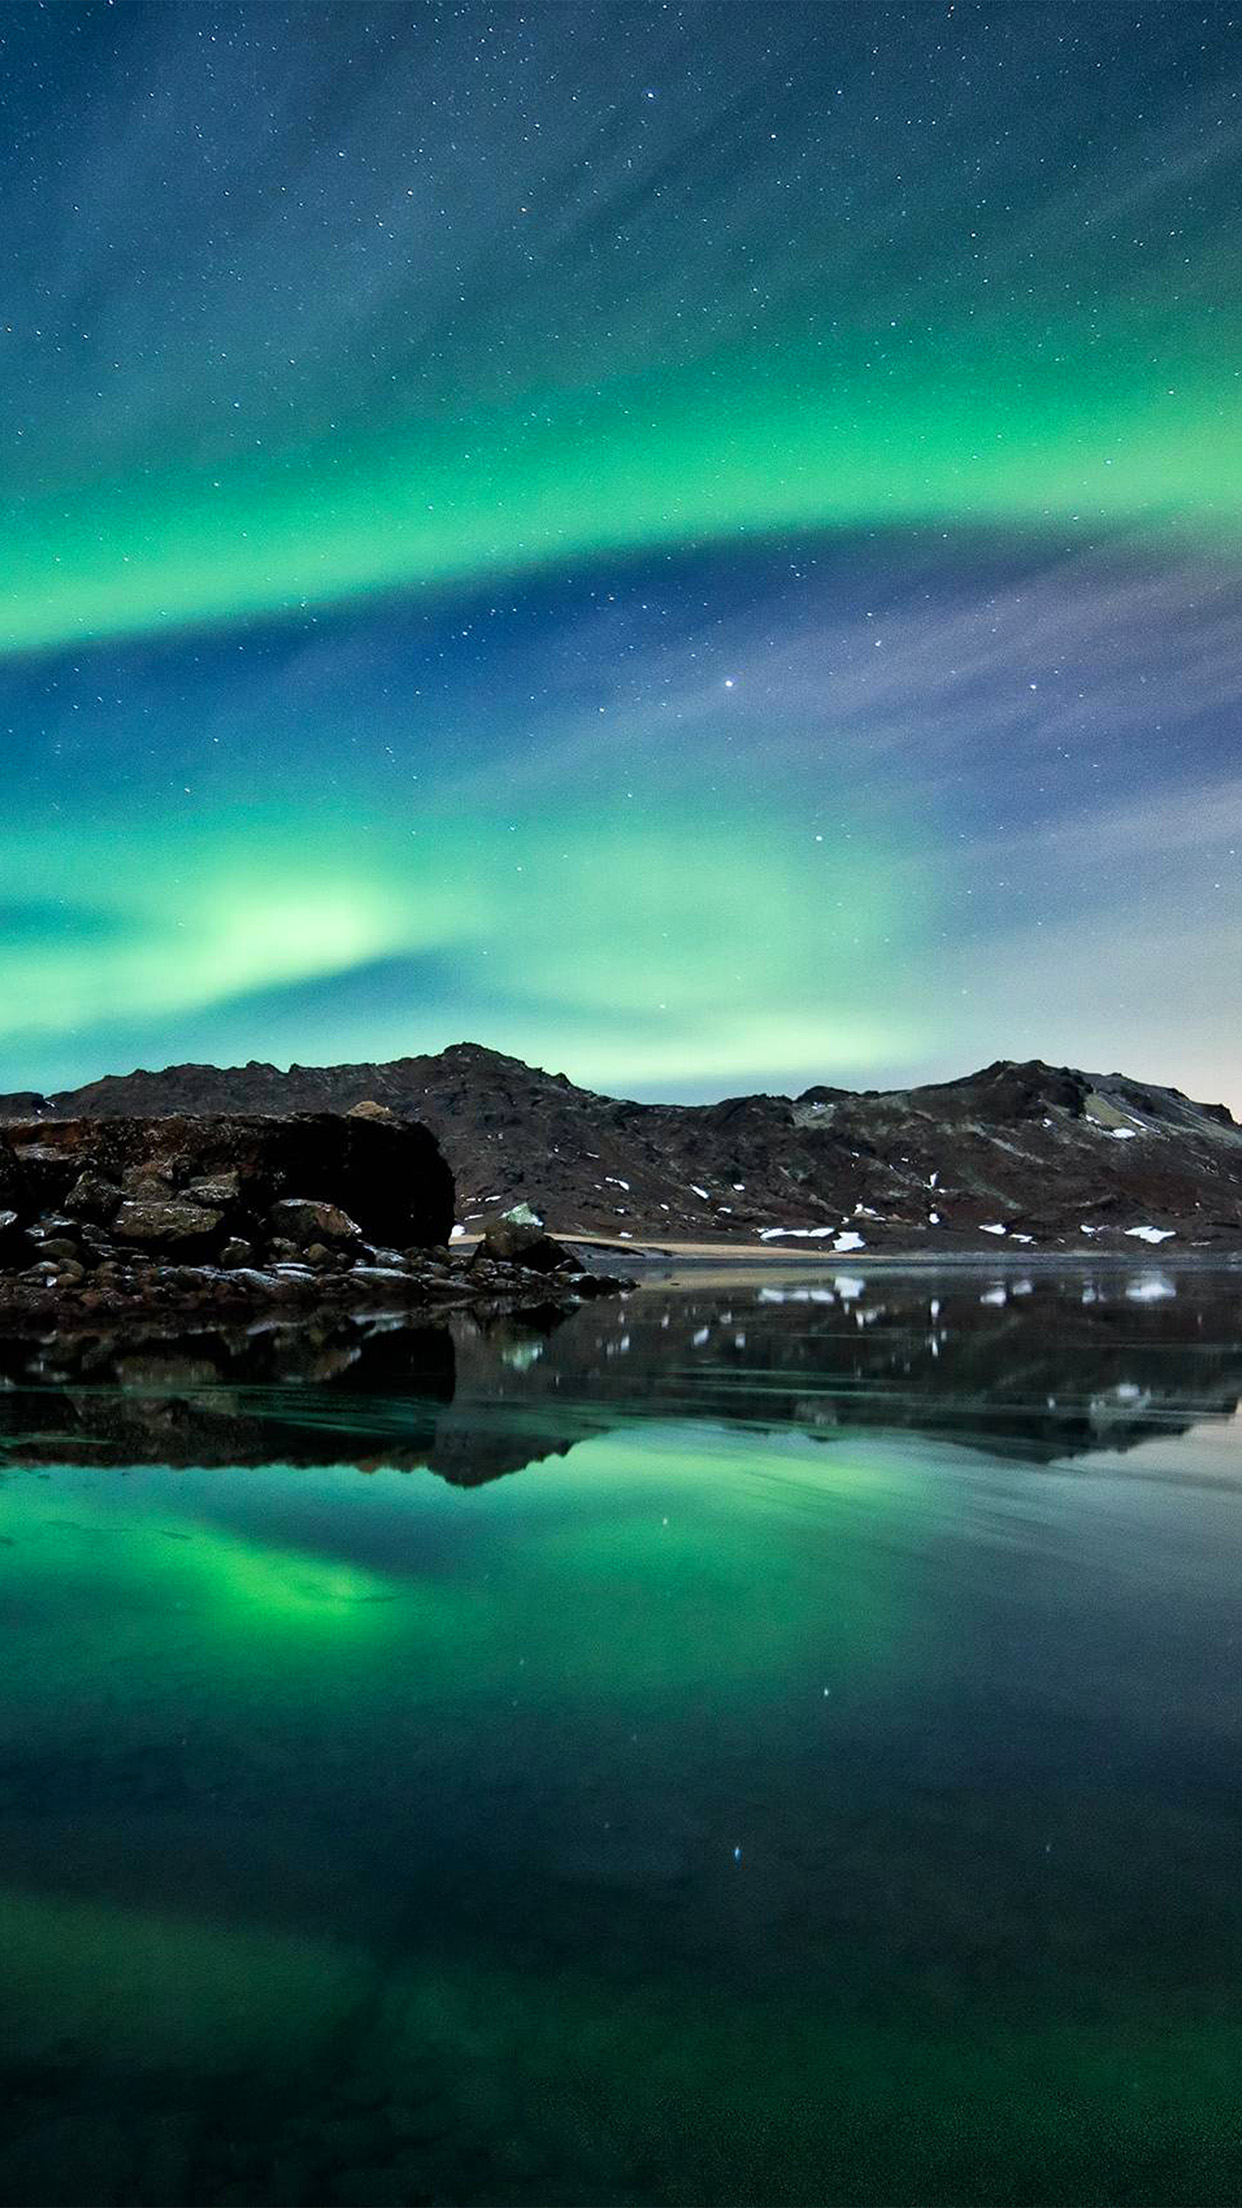 nw73-sea-night-aurora-space-nature-wallpaper